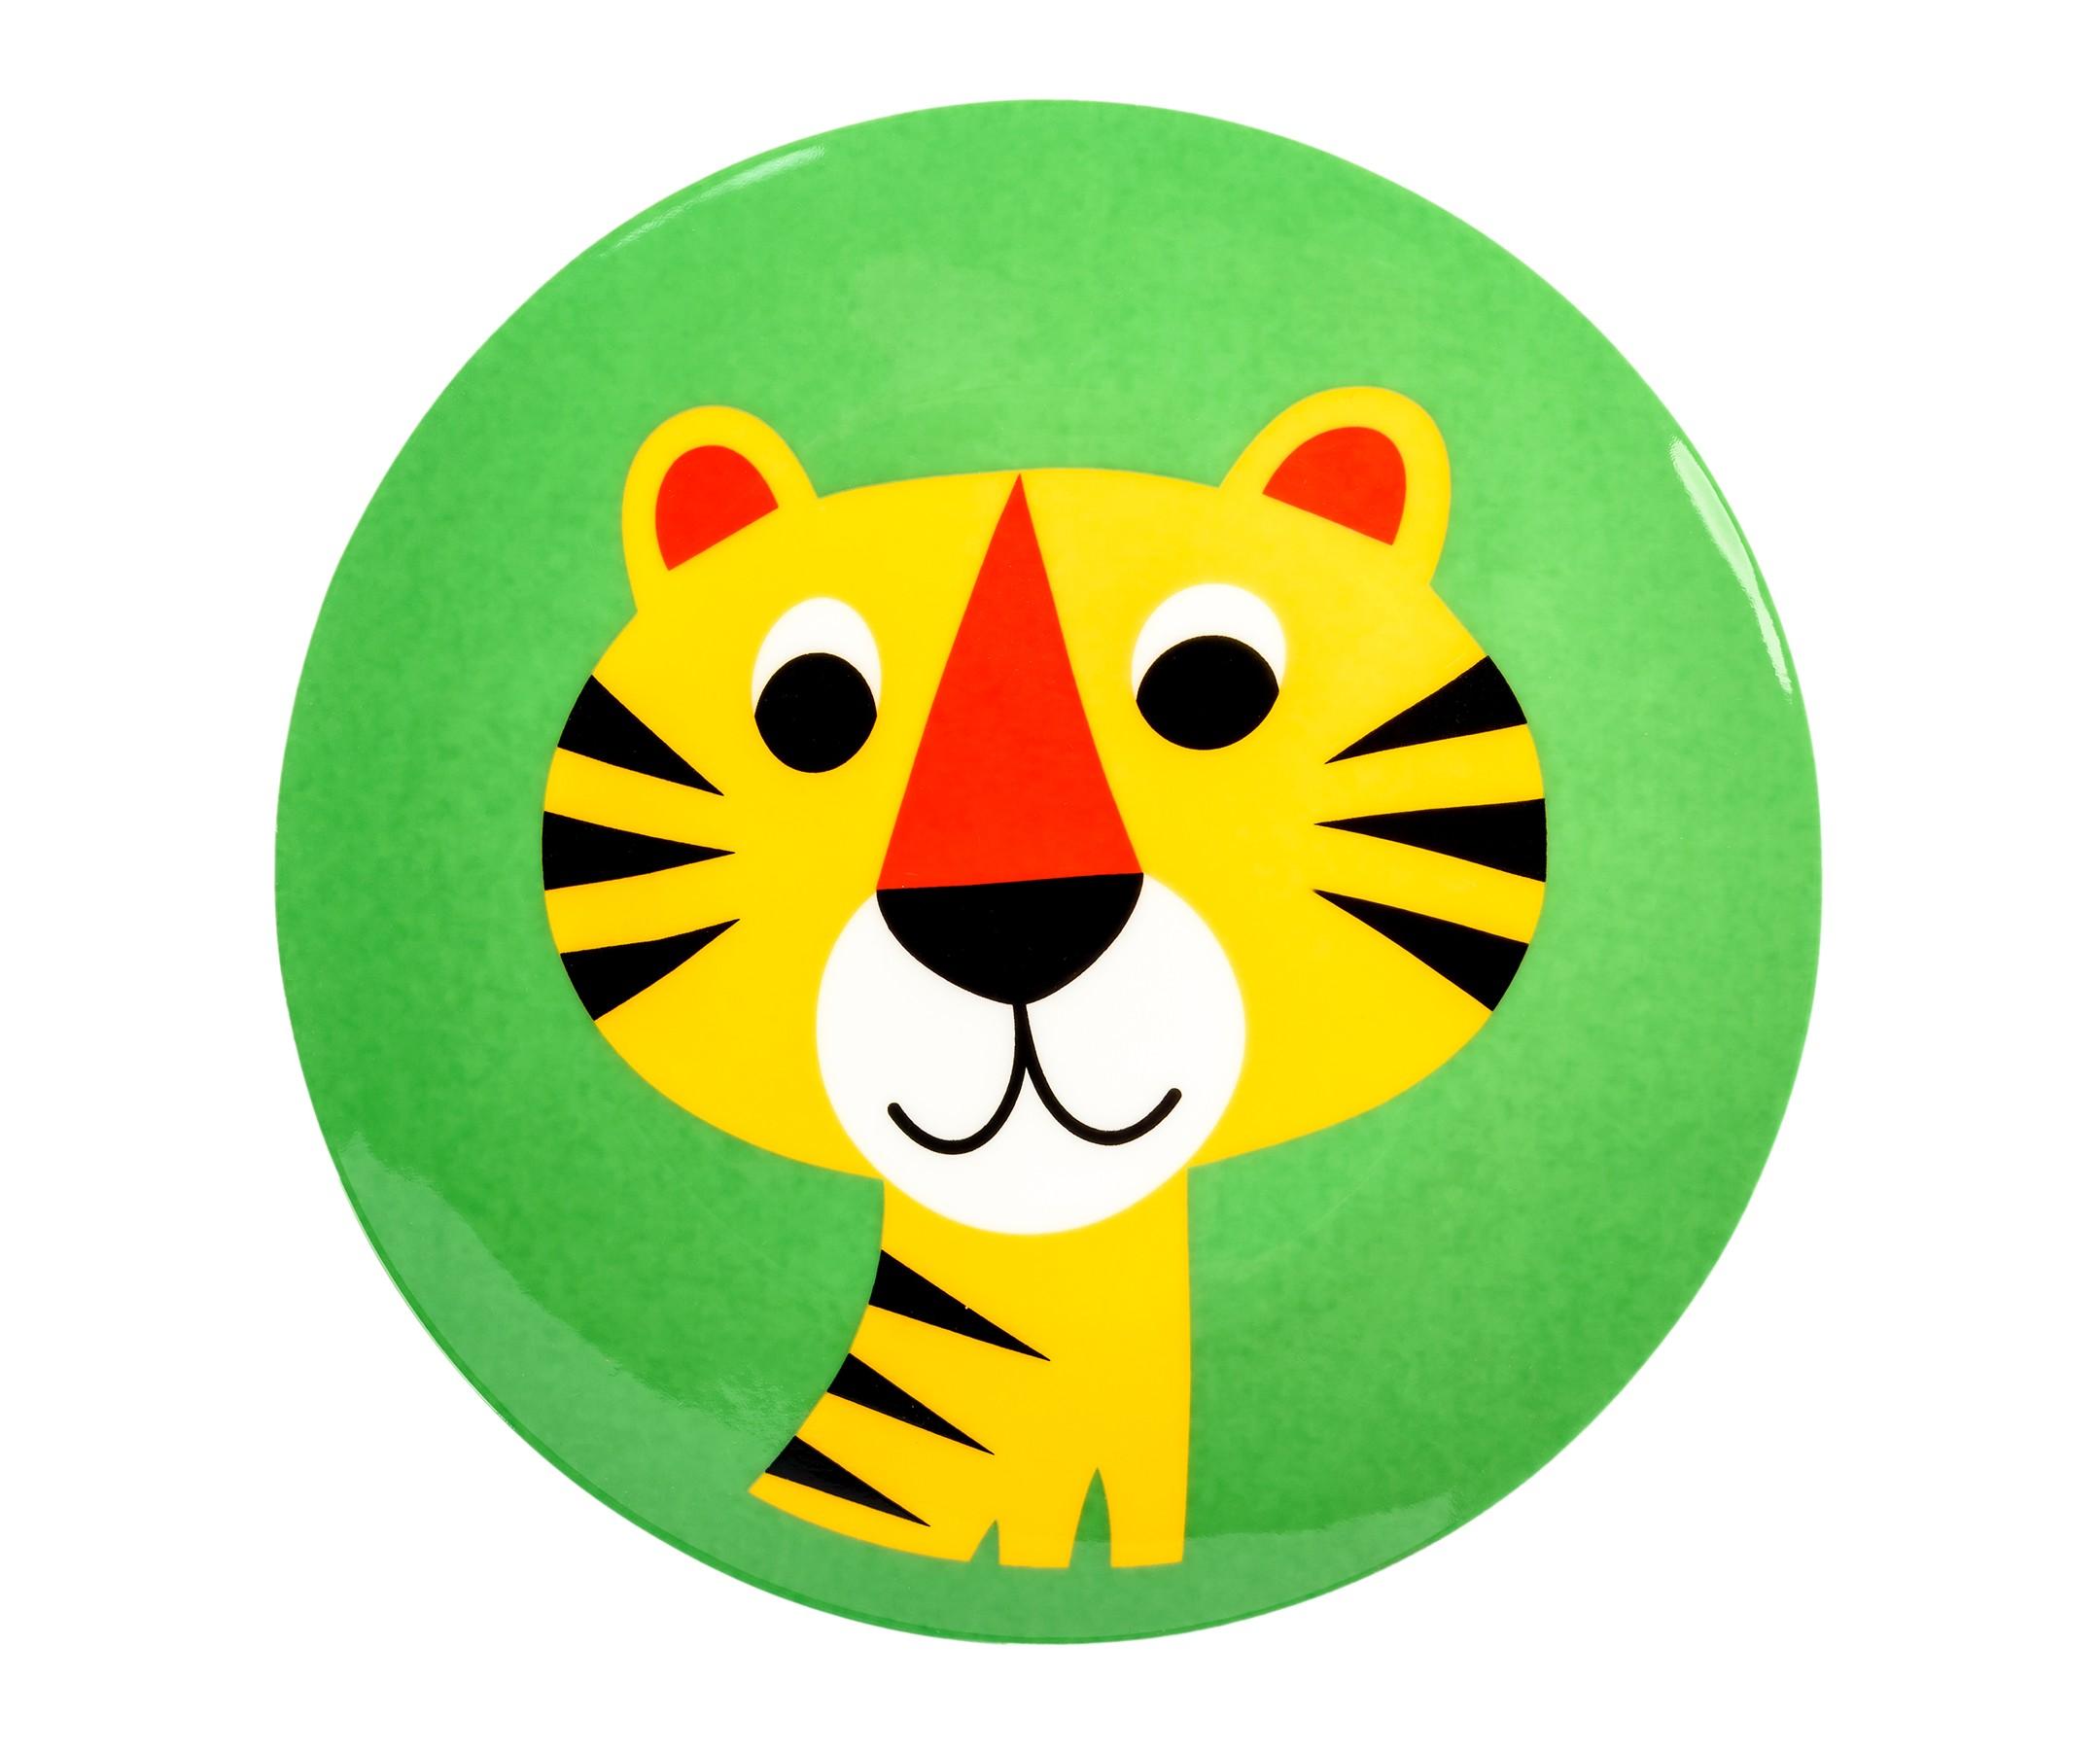 Тарелка ТигрёнокДекоративные тарелки<br><br><br>Material: Керамика<br>Ширина см: 20<br>Высота см: 2